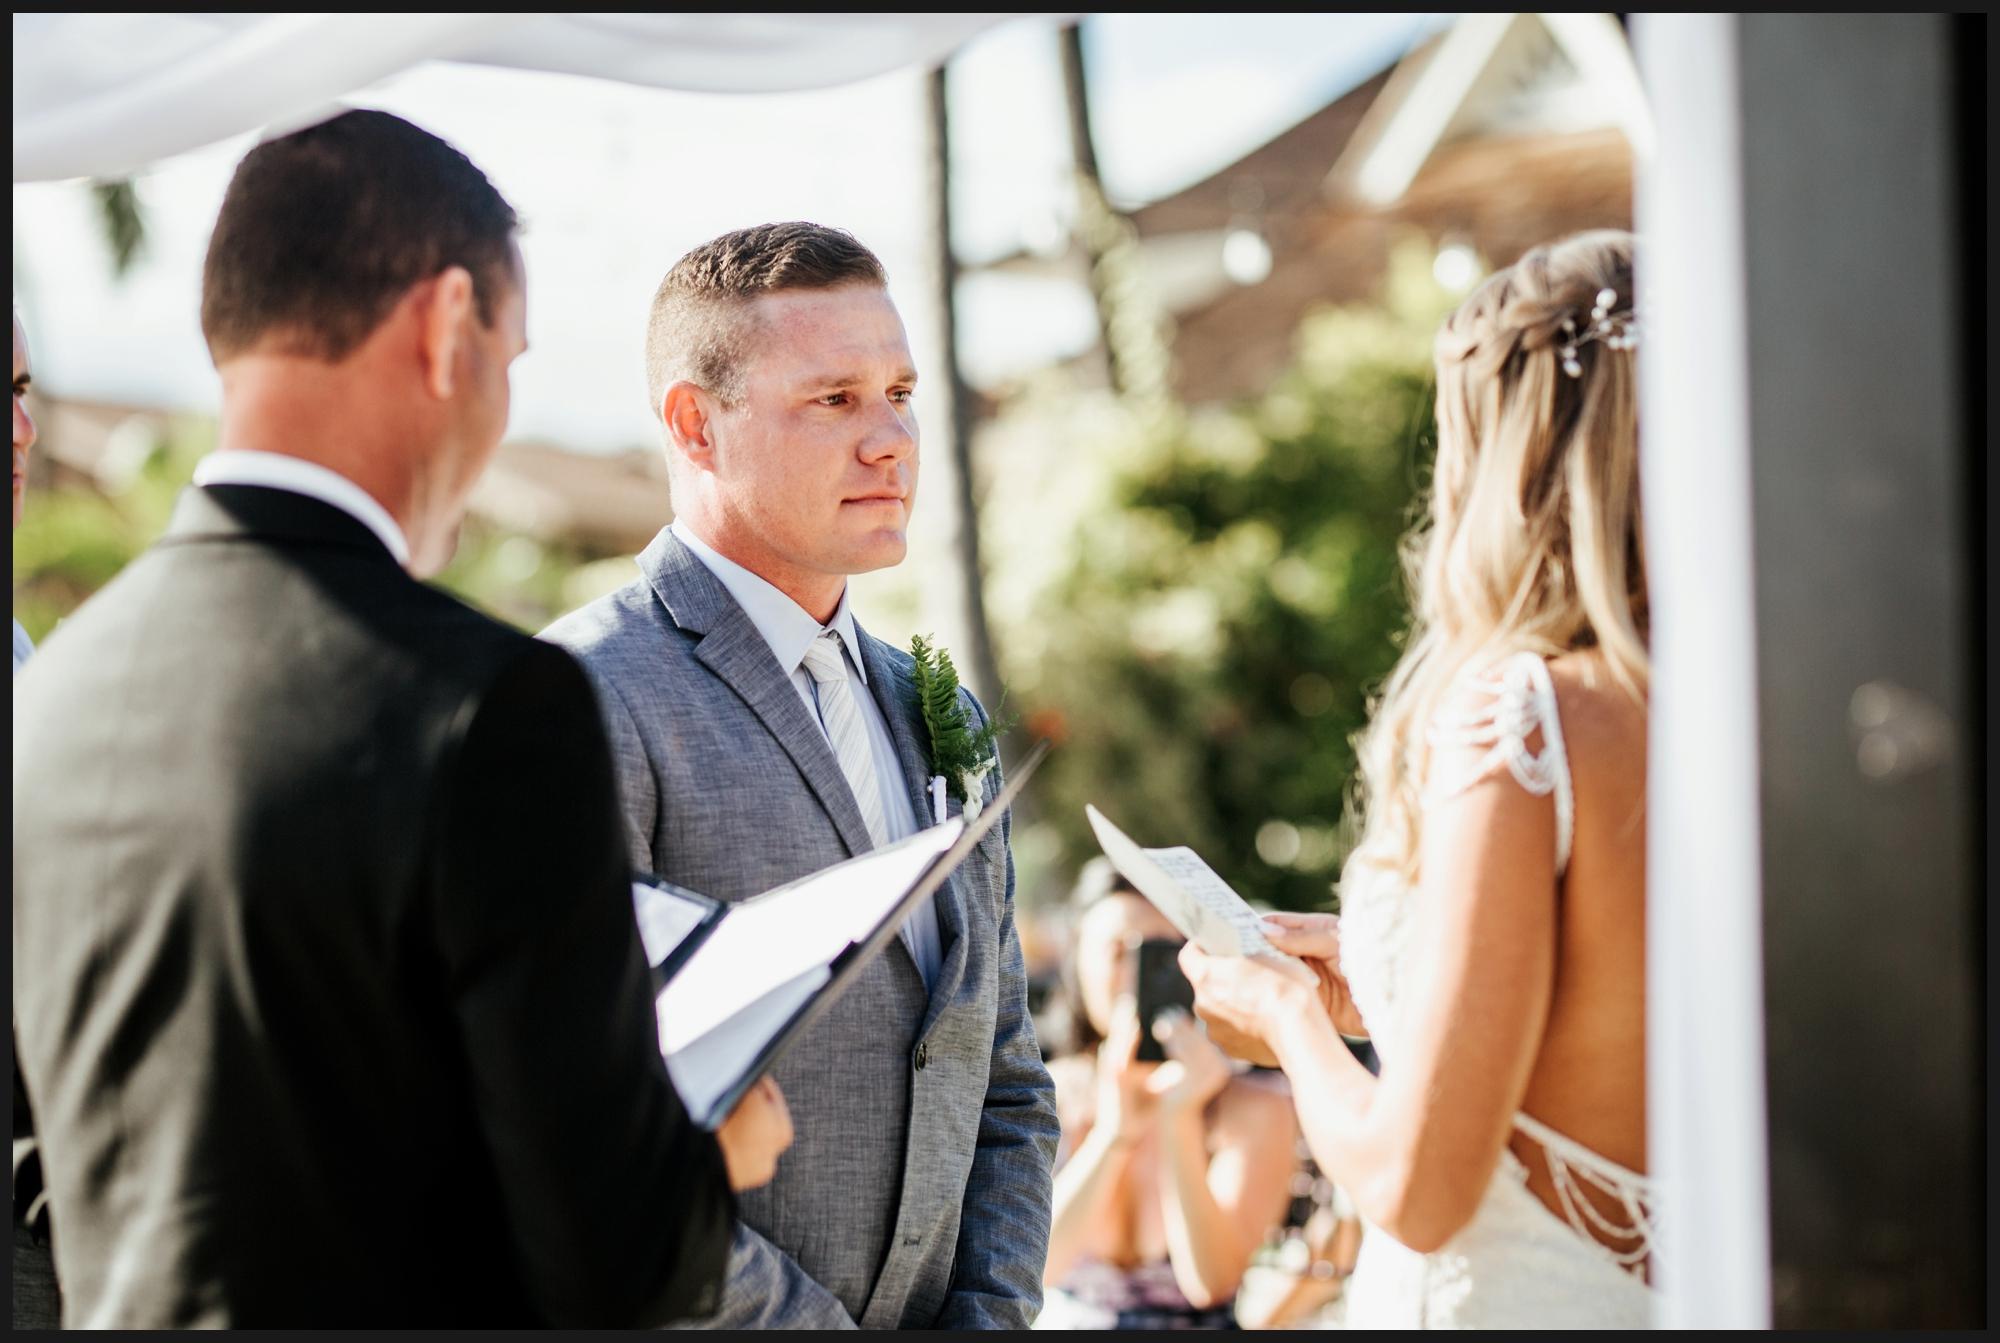 Orlando-Wedding-Photographer-destination-wedding-photographer-florida-wedding-photographer-hawaii-wedding-photographer_0061.jpg